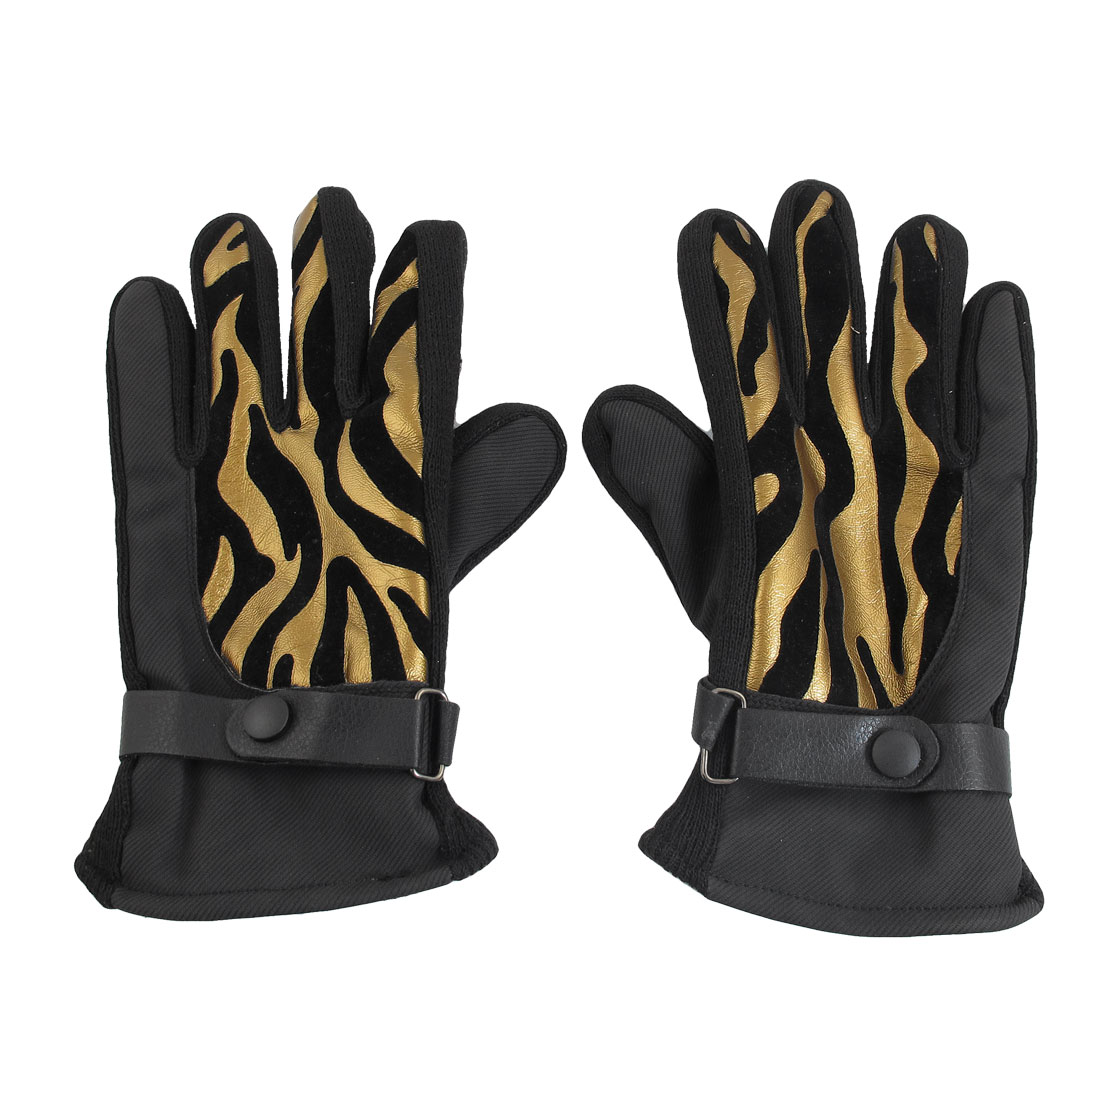 Fleece Lining Golden Tone Black Skiing Snowboard Winter Snow Gloves